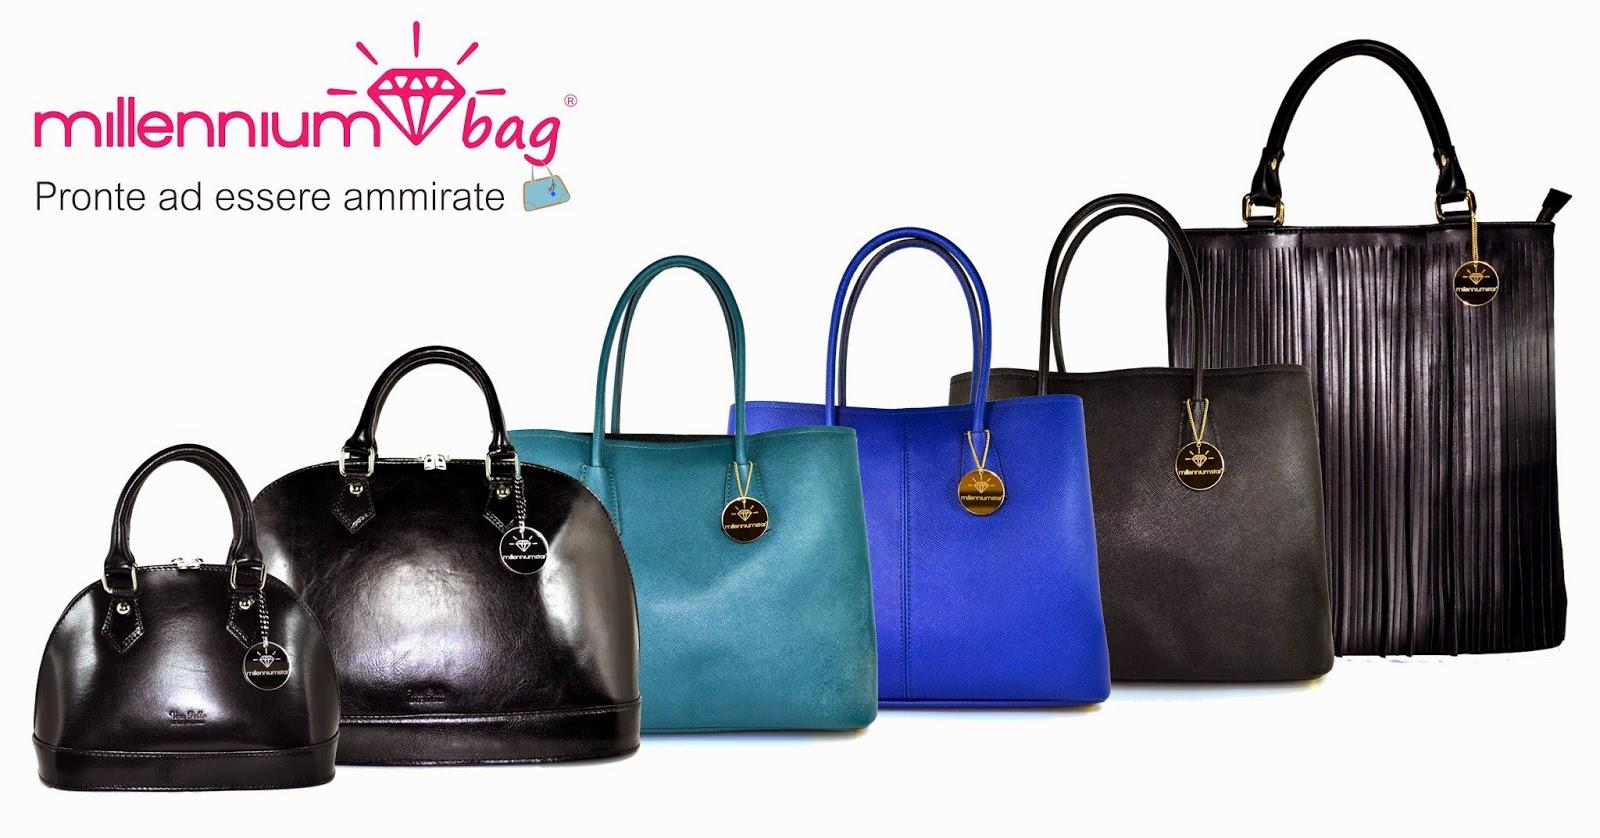 Borse da donna Millennium Bag